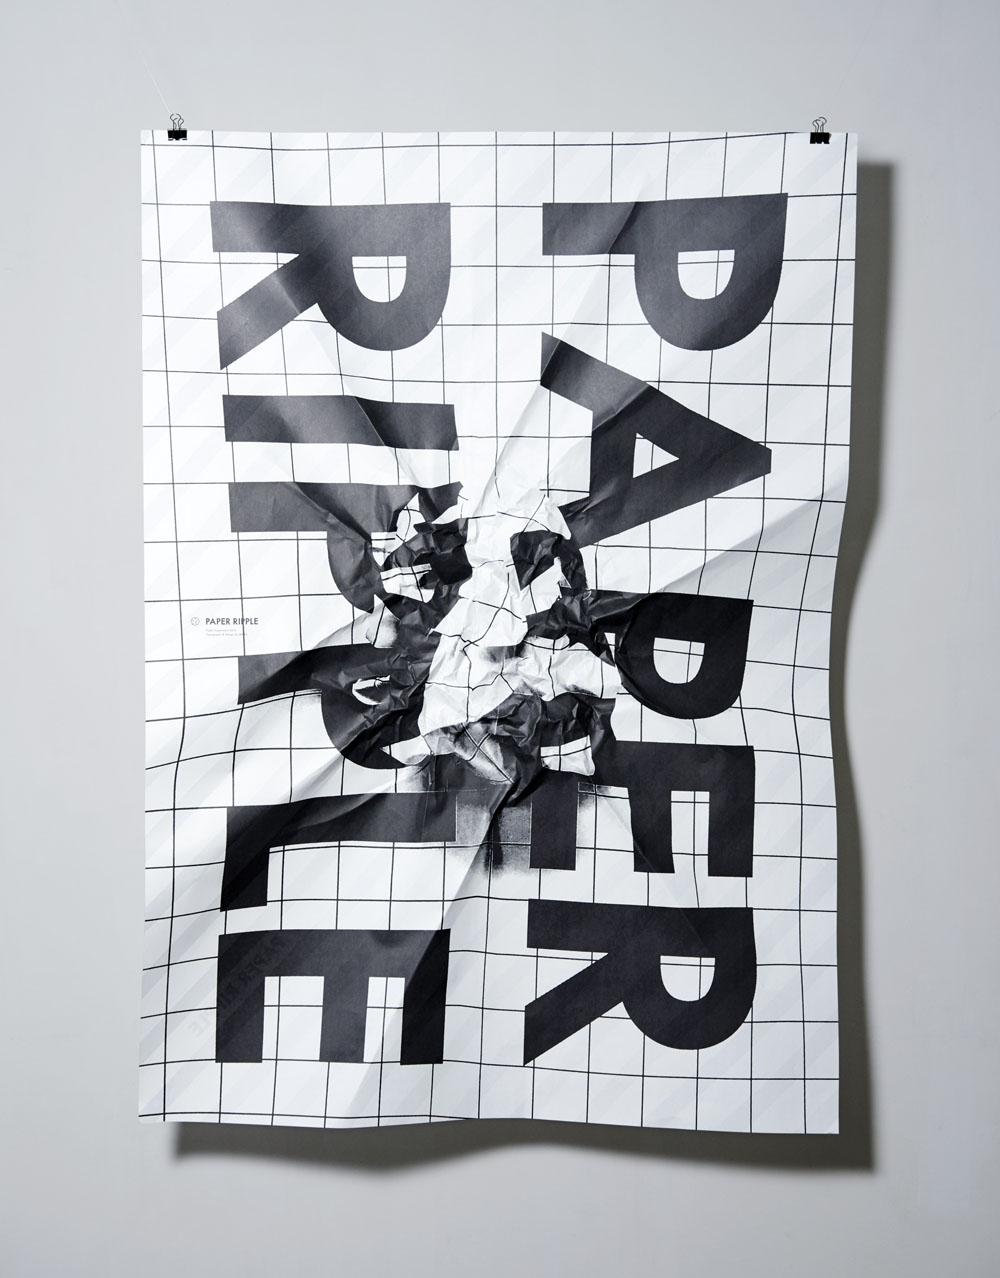 PAPER RIPPLE